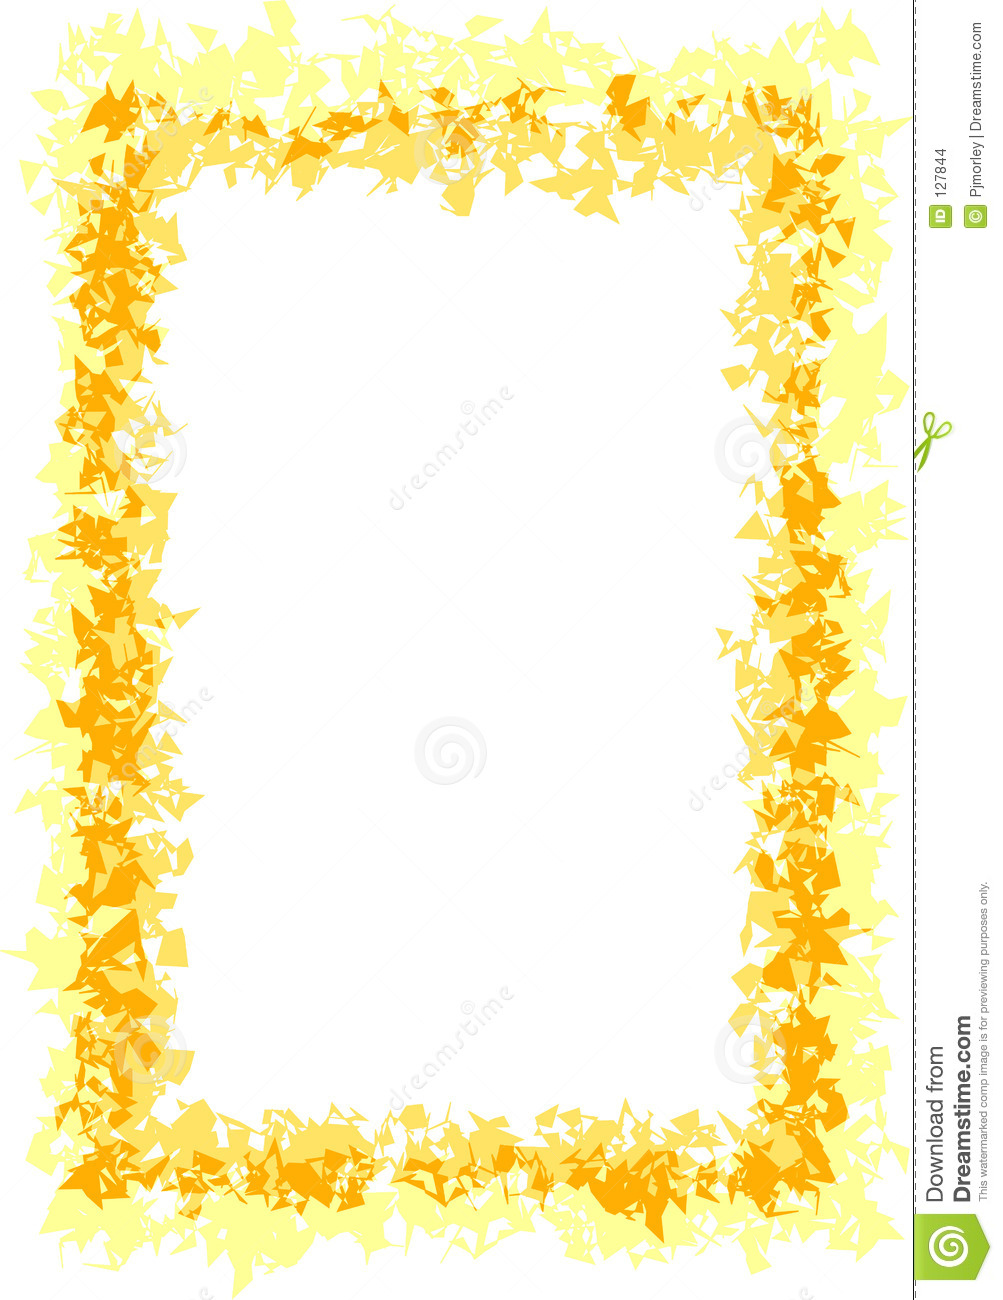 Yellow Border Clipart.